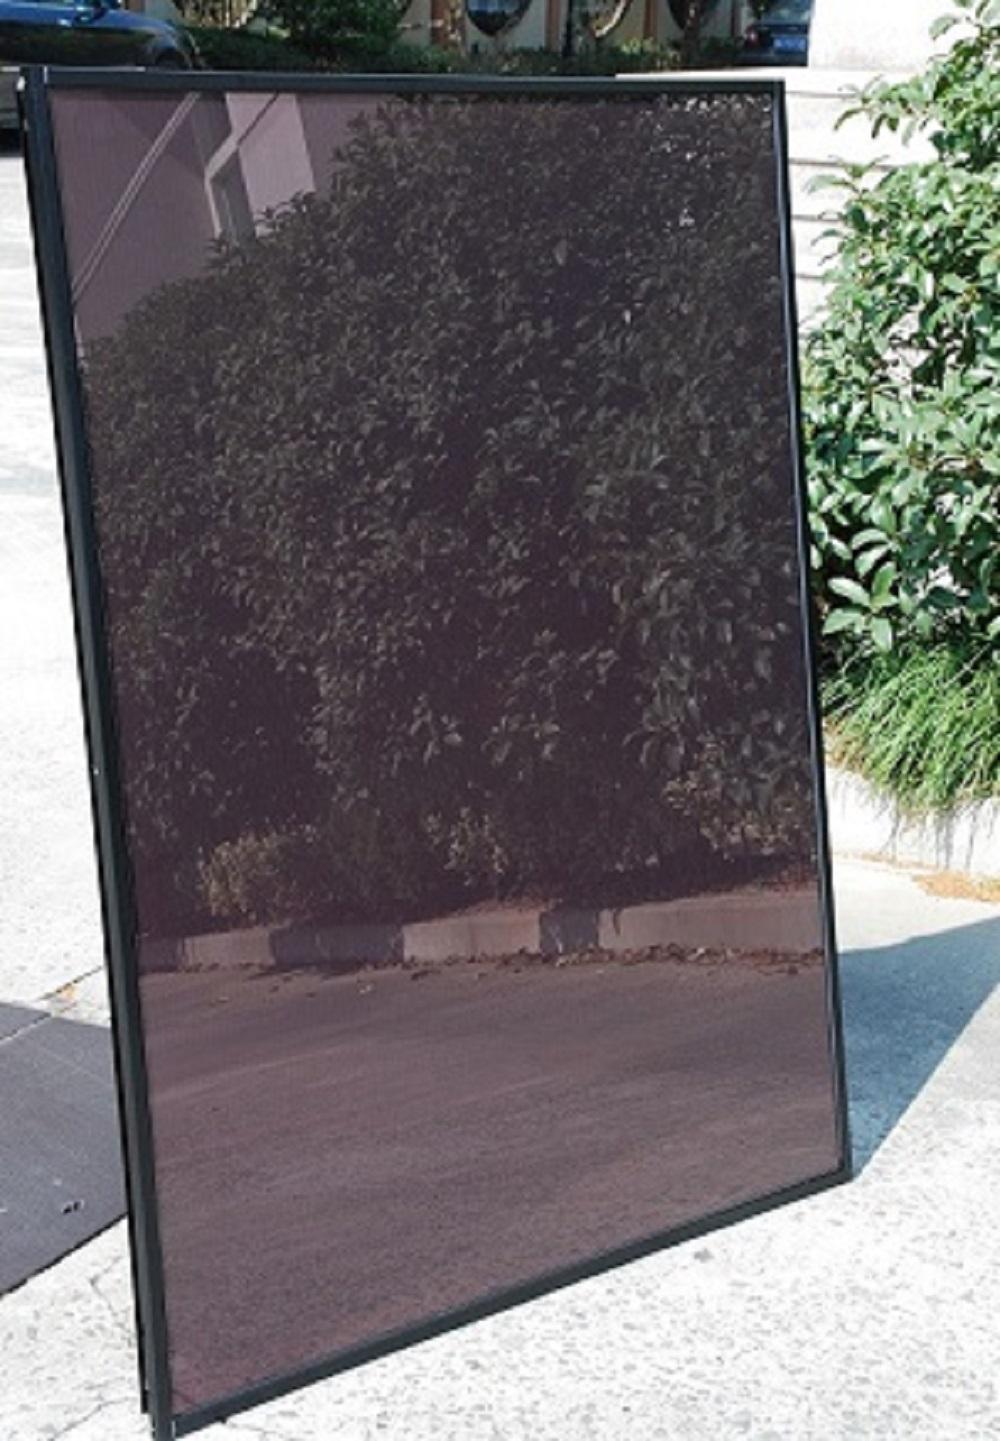 110W single glass with aluminum frame amorphous silicon thin film solar panel